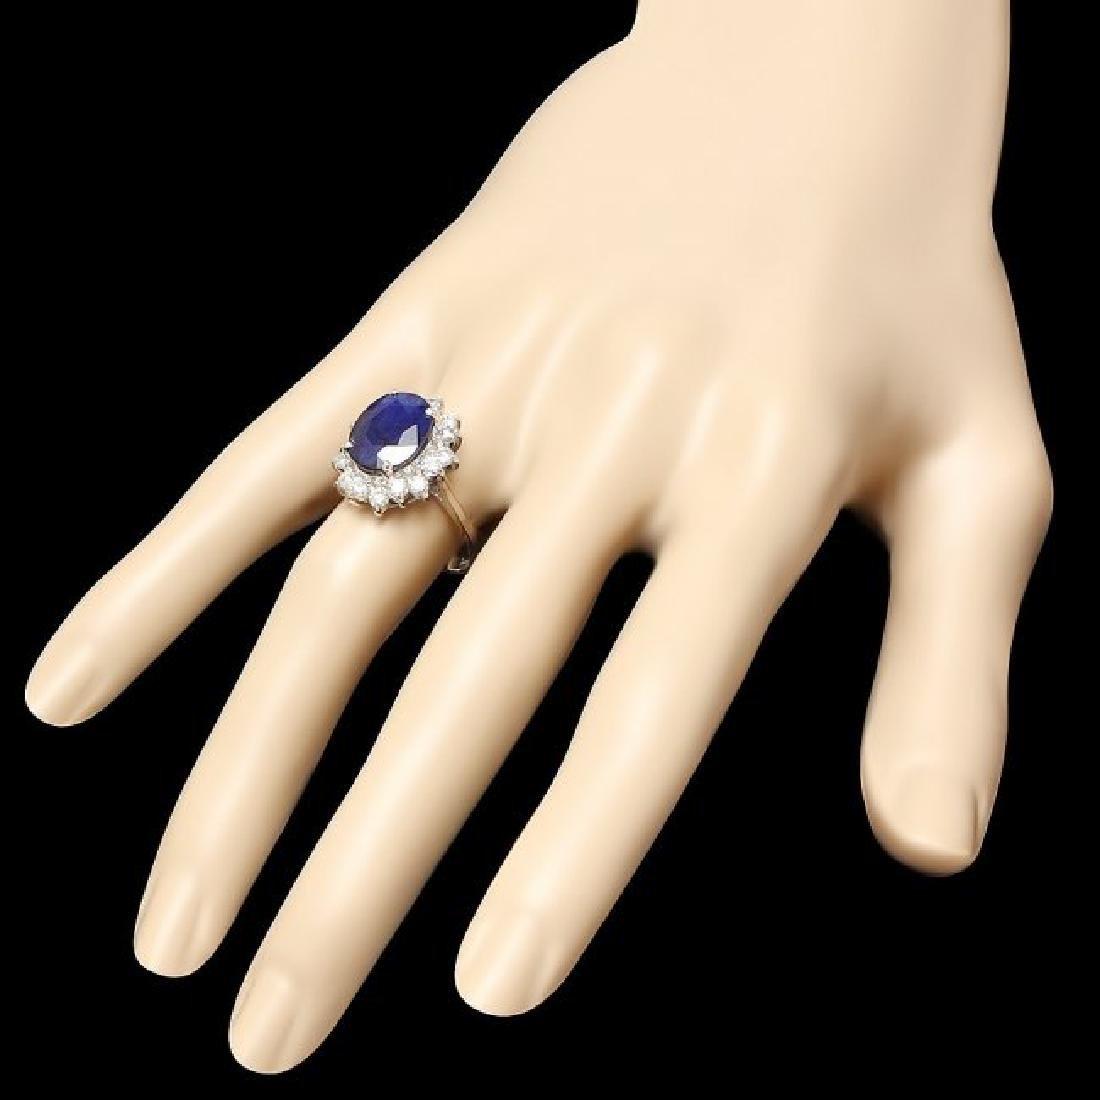 14k Gold 5.52ct Sapphire 0.90ct Diamond Ring - 3